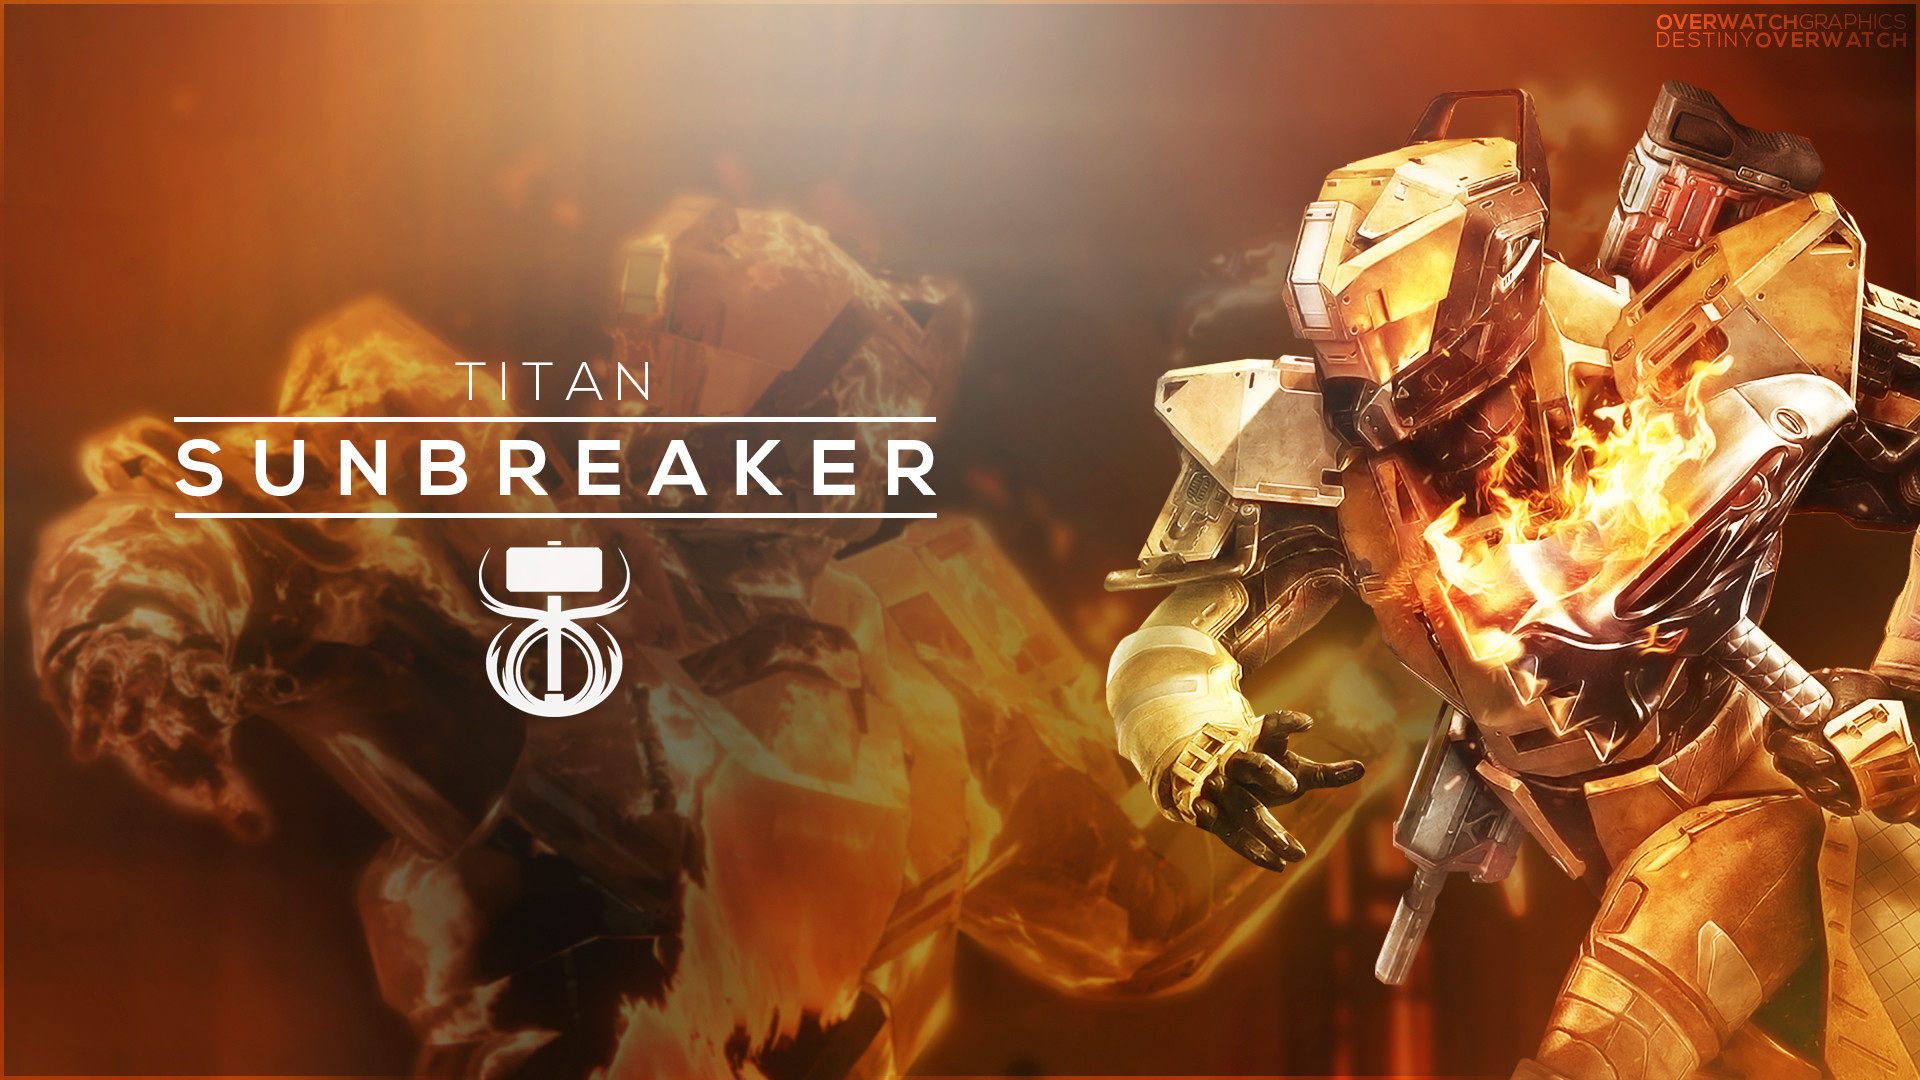 … OverwatchGraphics Destiny the Game – Sunbreaker Wallpaper by  OverwatchGraphics